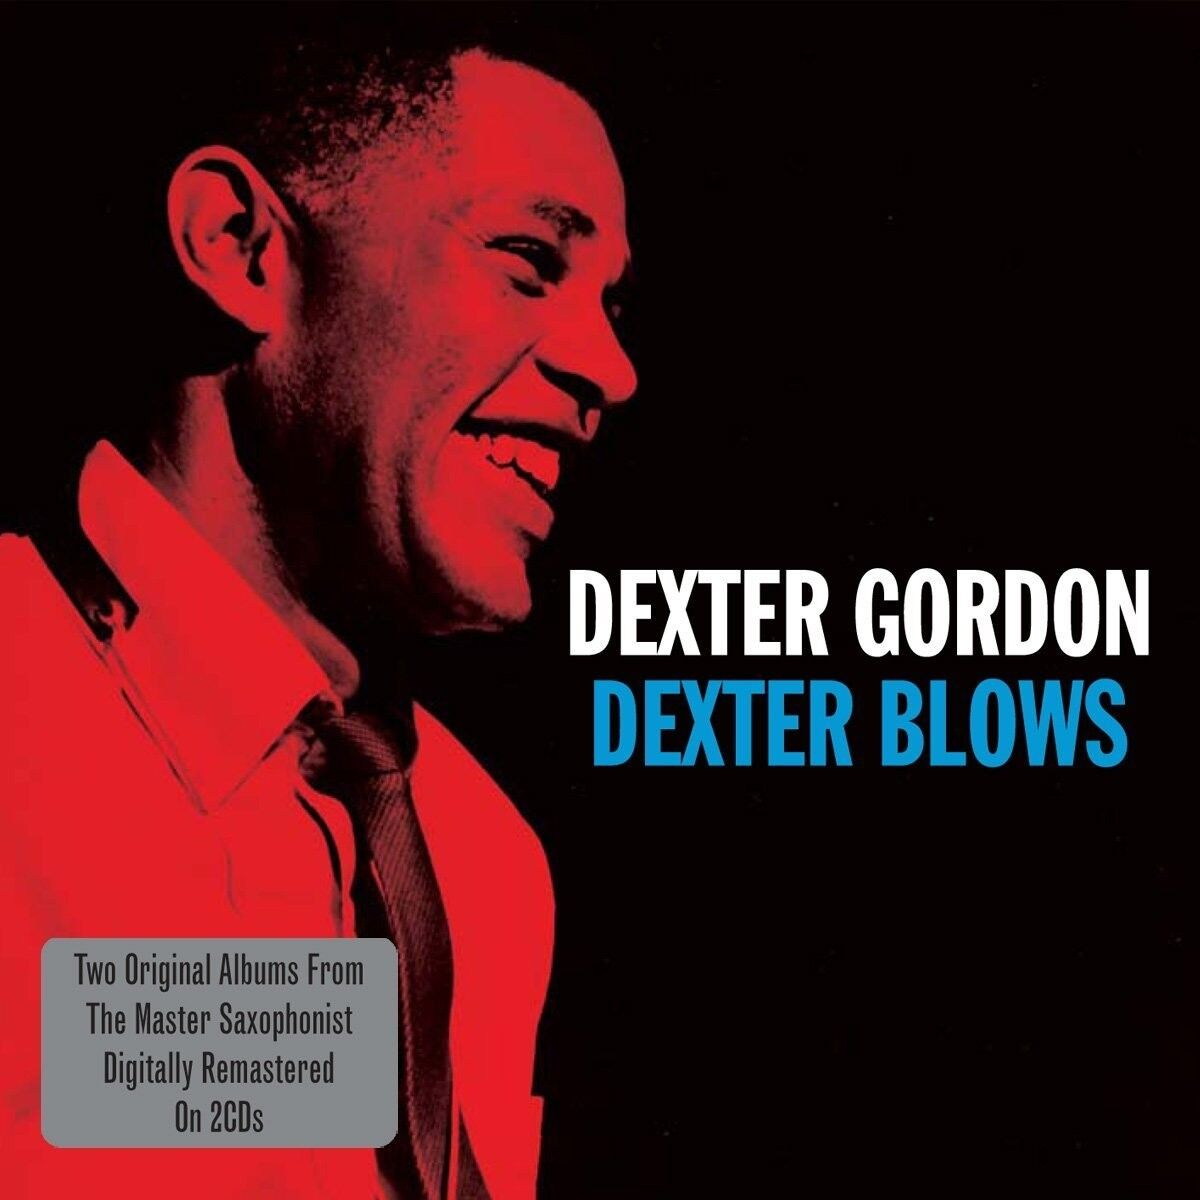 Dexter Gordon - Dexter Blows Cd2 Notnow Neu